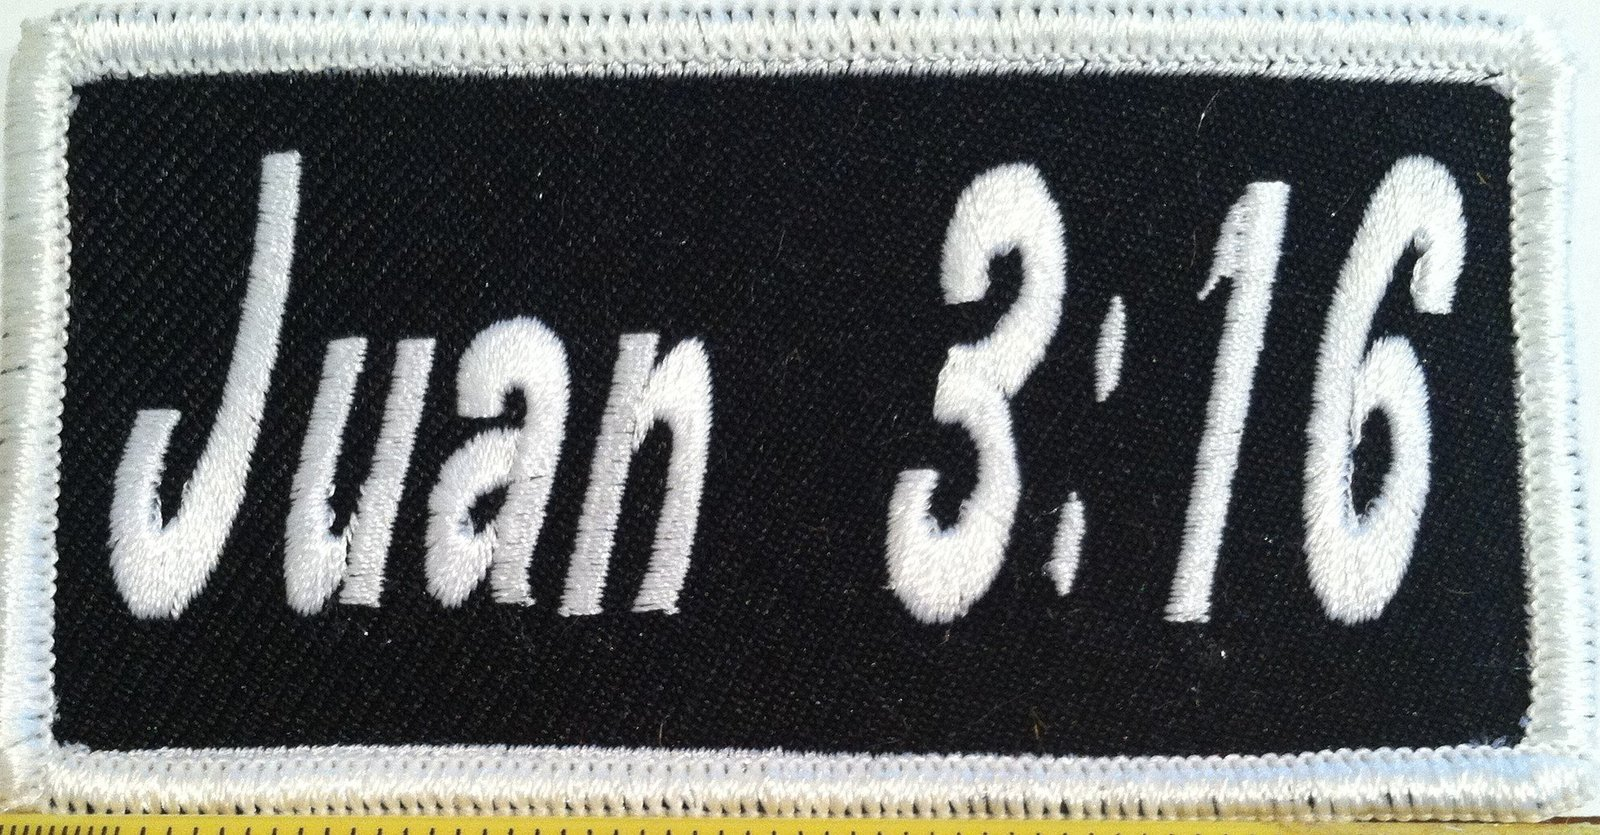 Embroidery Iron-On Patch Biker Emblem White Border TAKE NO SHI GIVE NO SHI